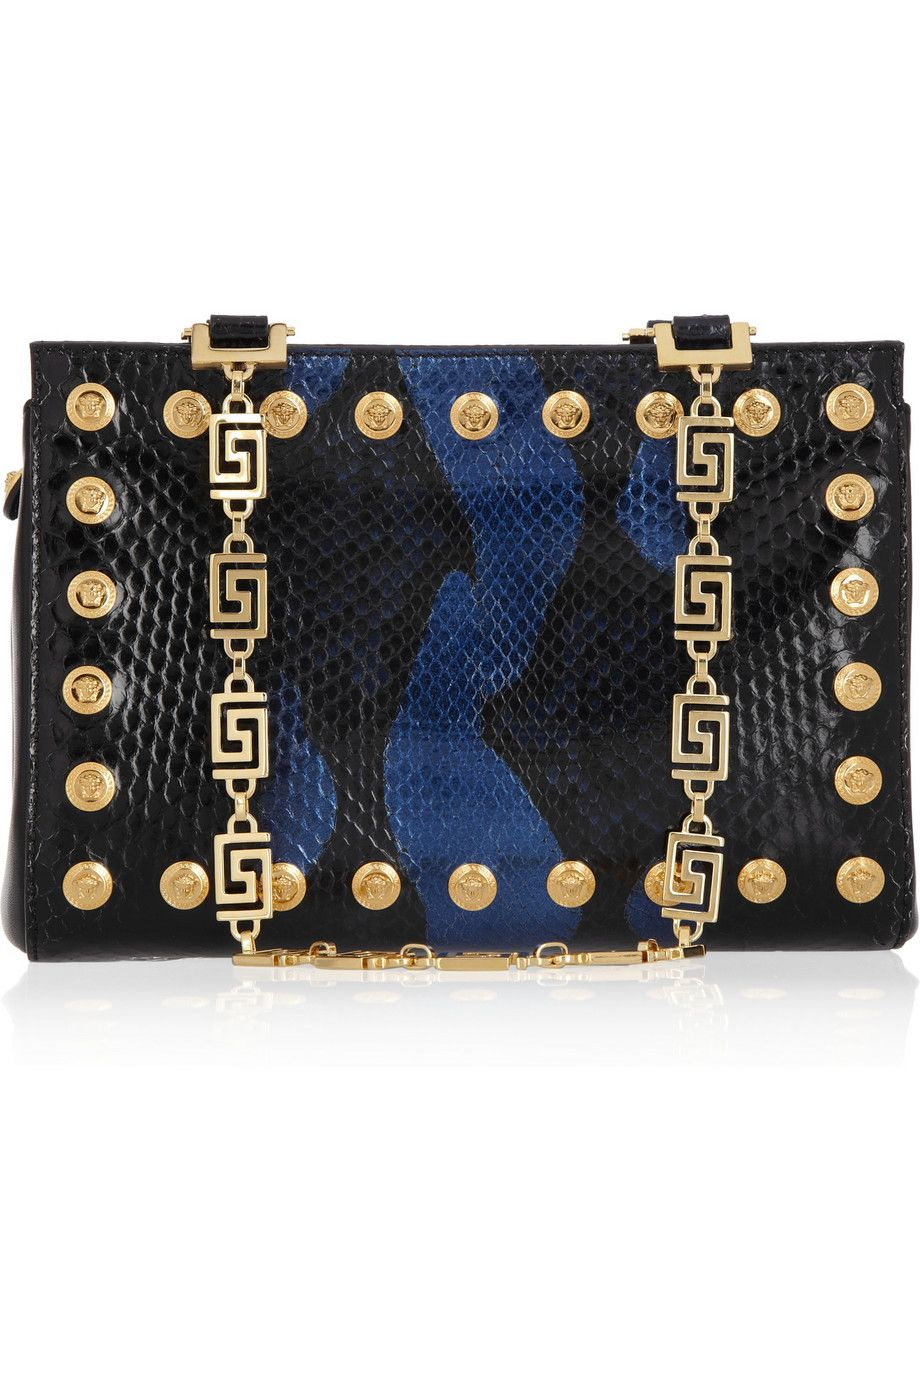 Versace | My Versace | Bags, Versace, Versace bag